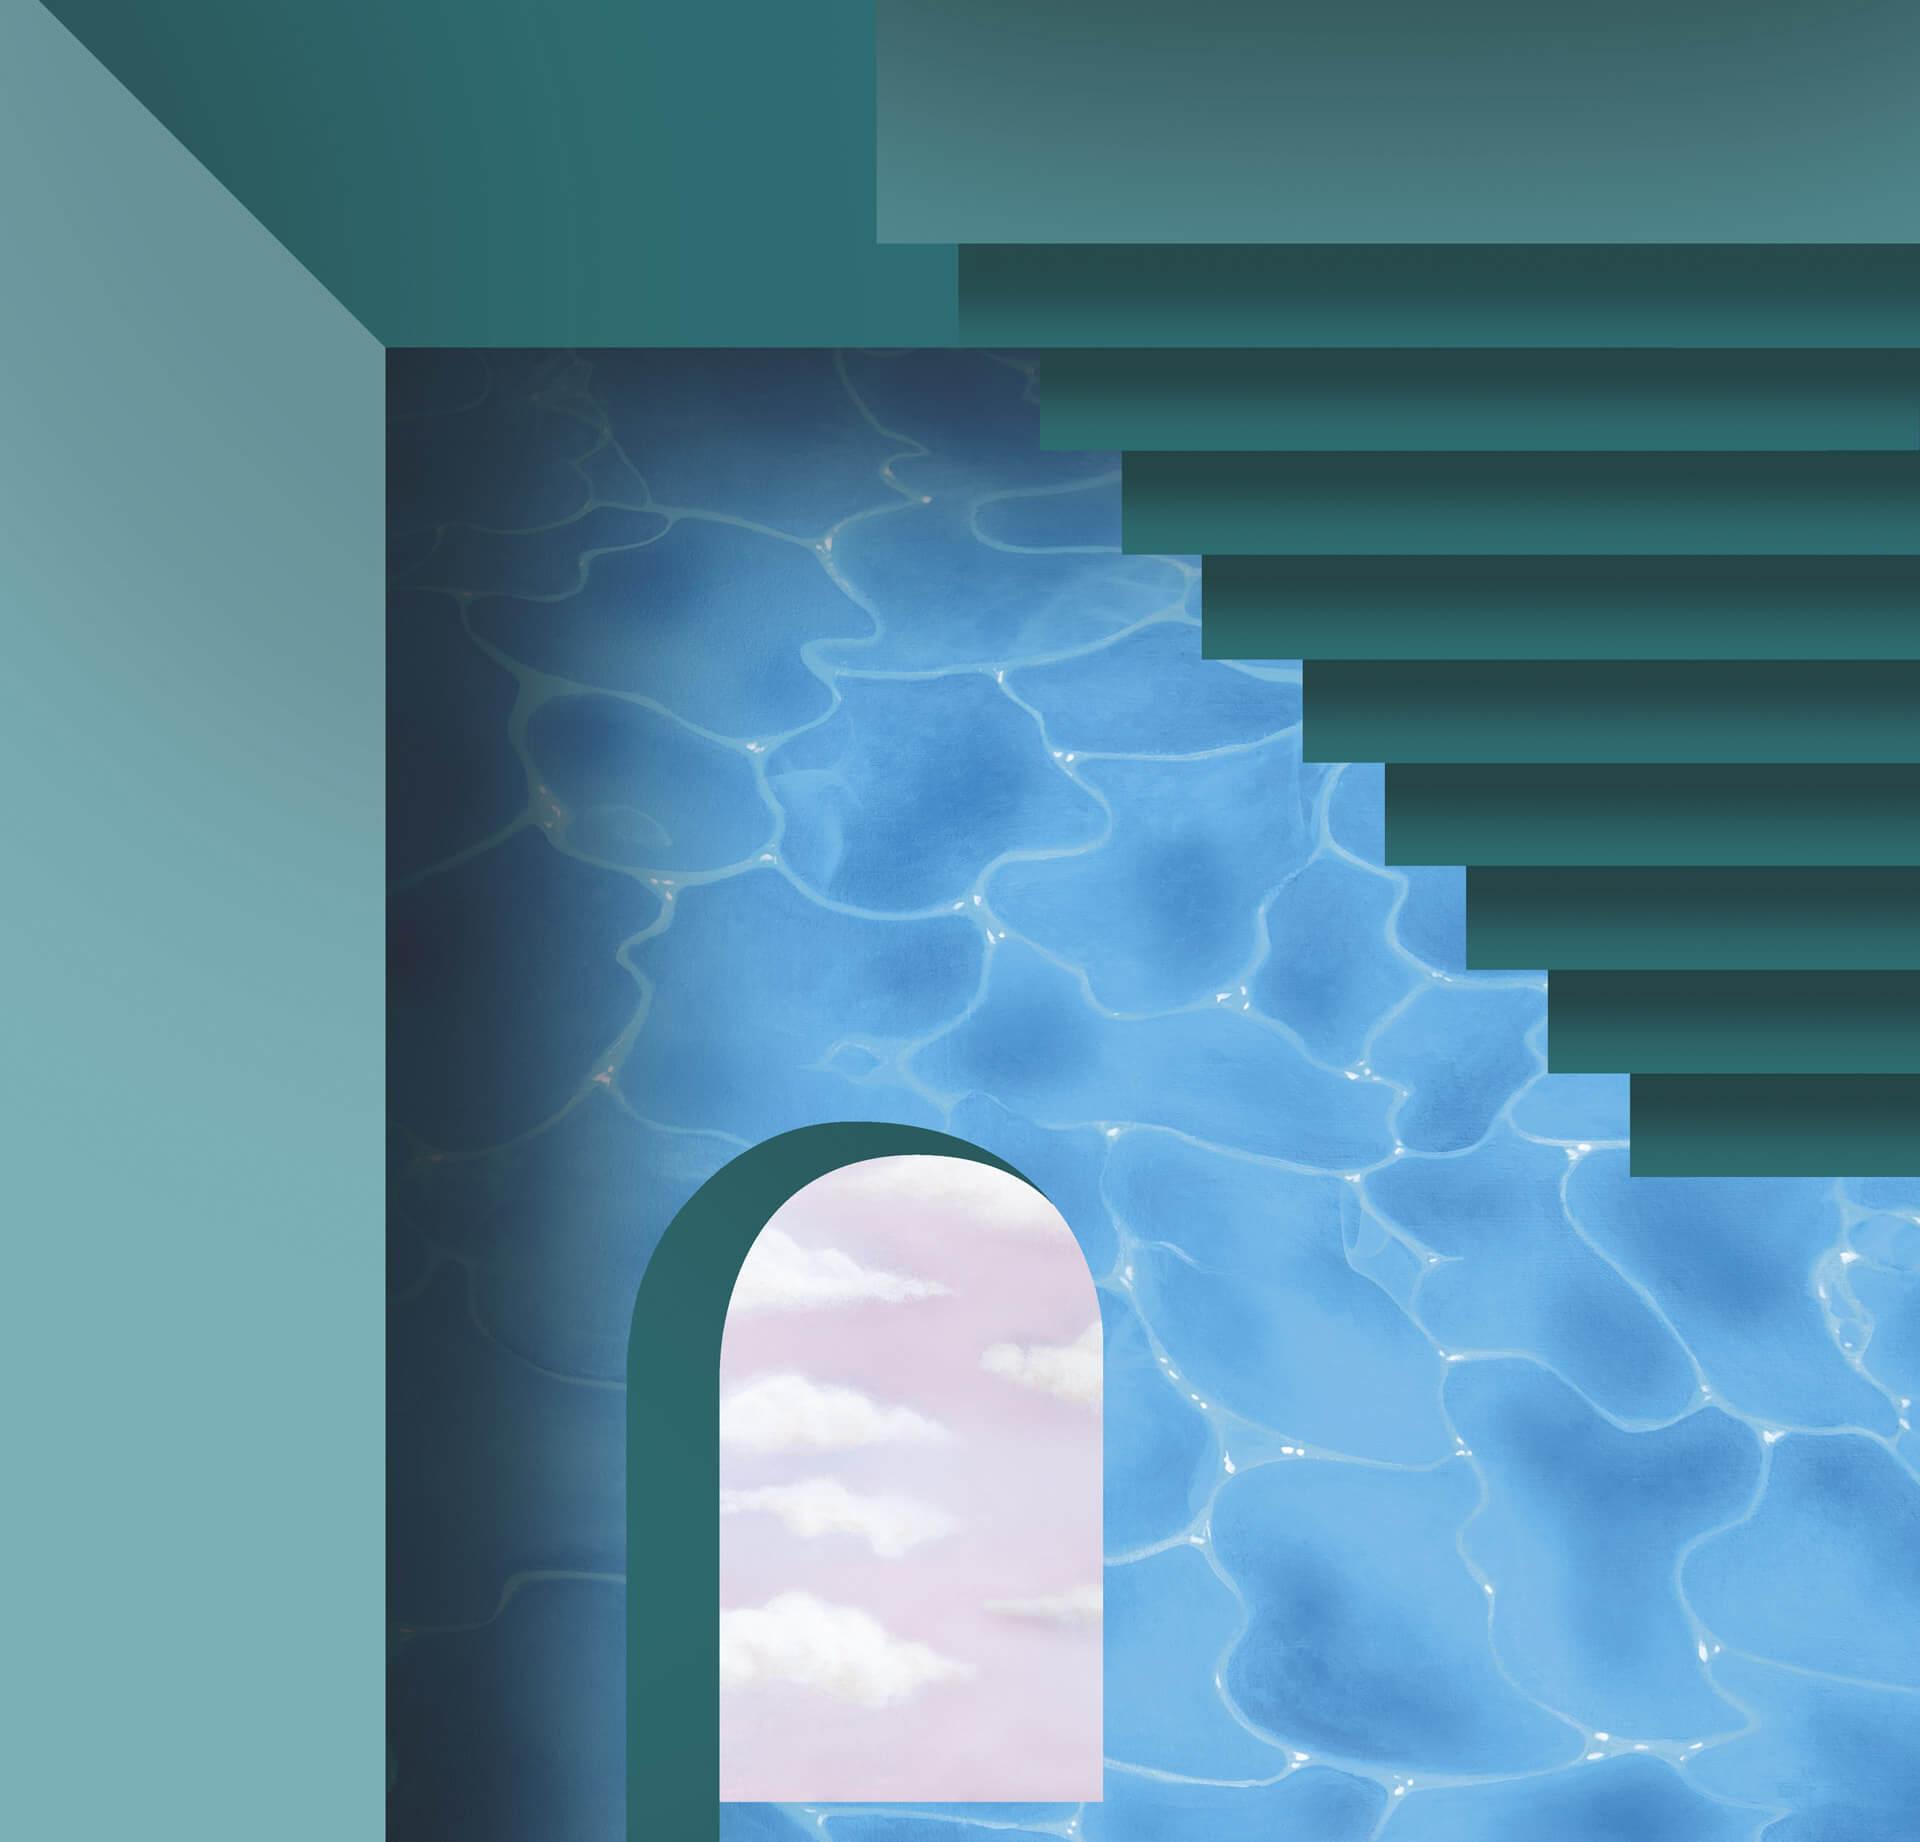 hermes-window-spring19-illustration2